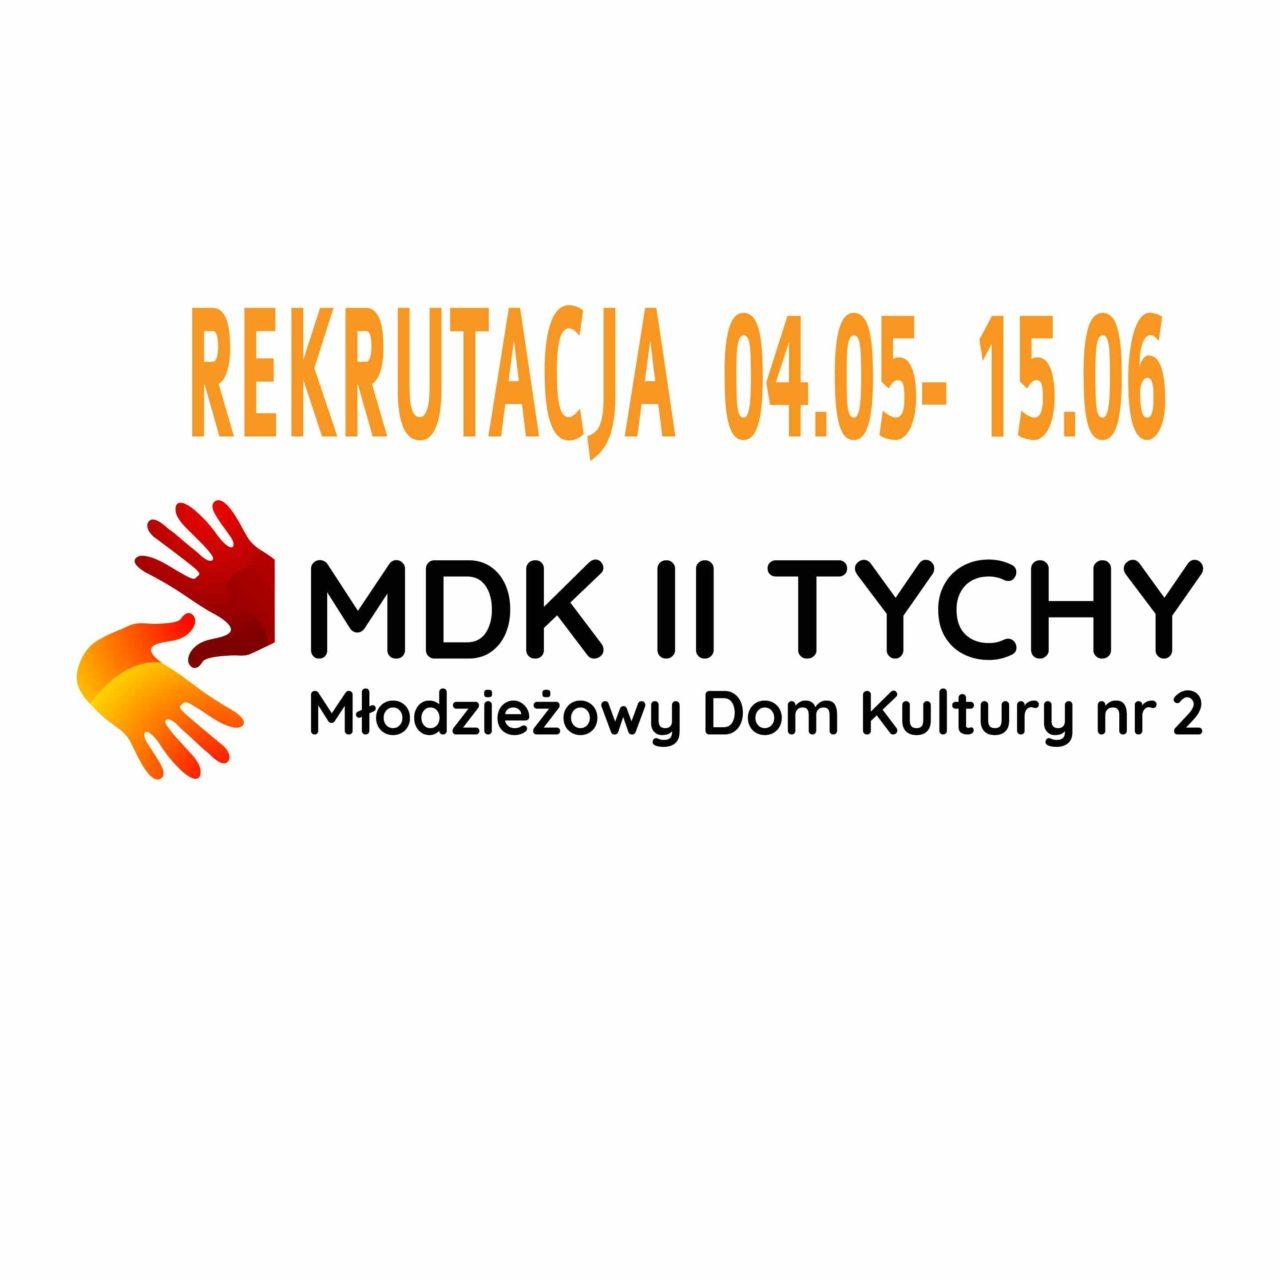 https://mdk2tychy.pl/wp-content/uploads/2021/04/Zasob-13-1280x1280.jpg